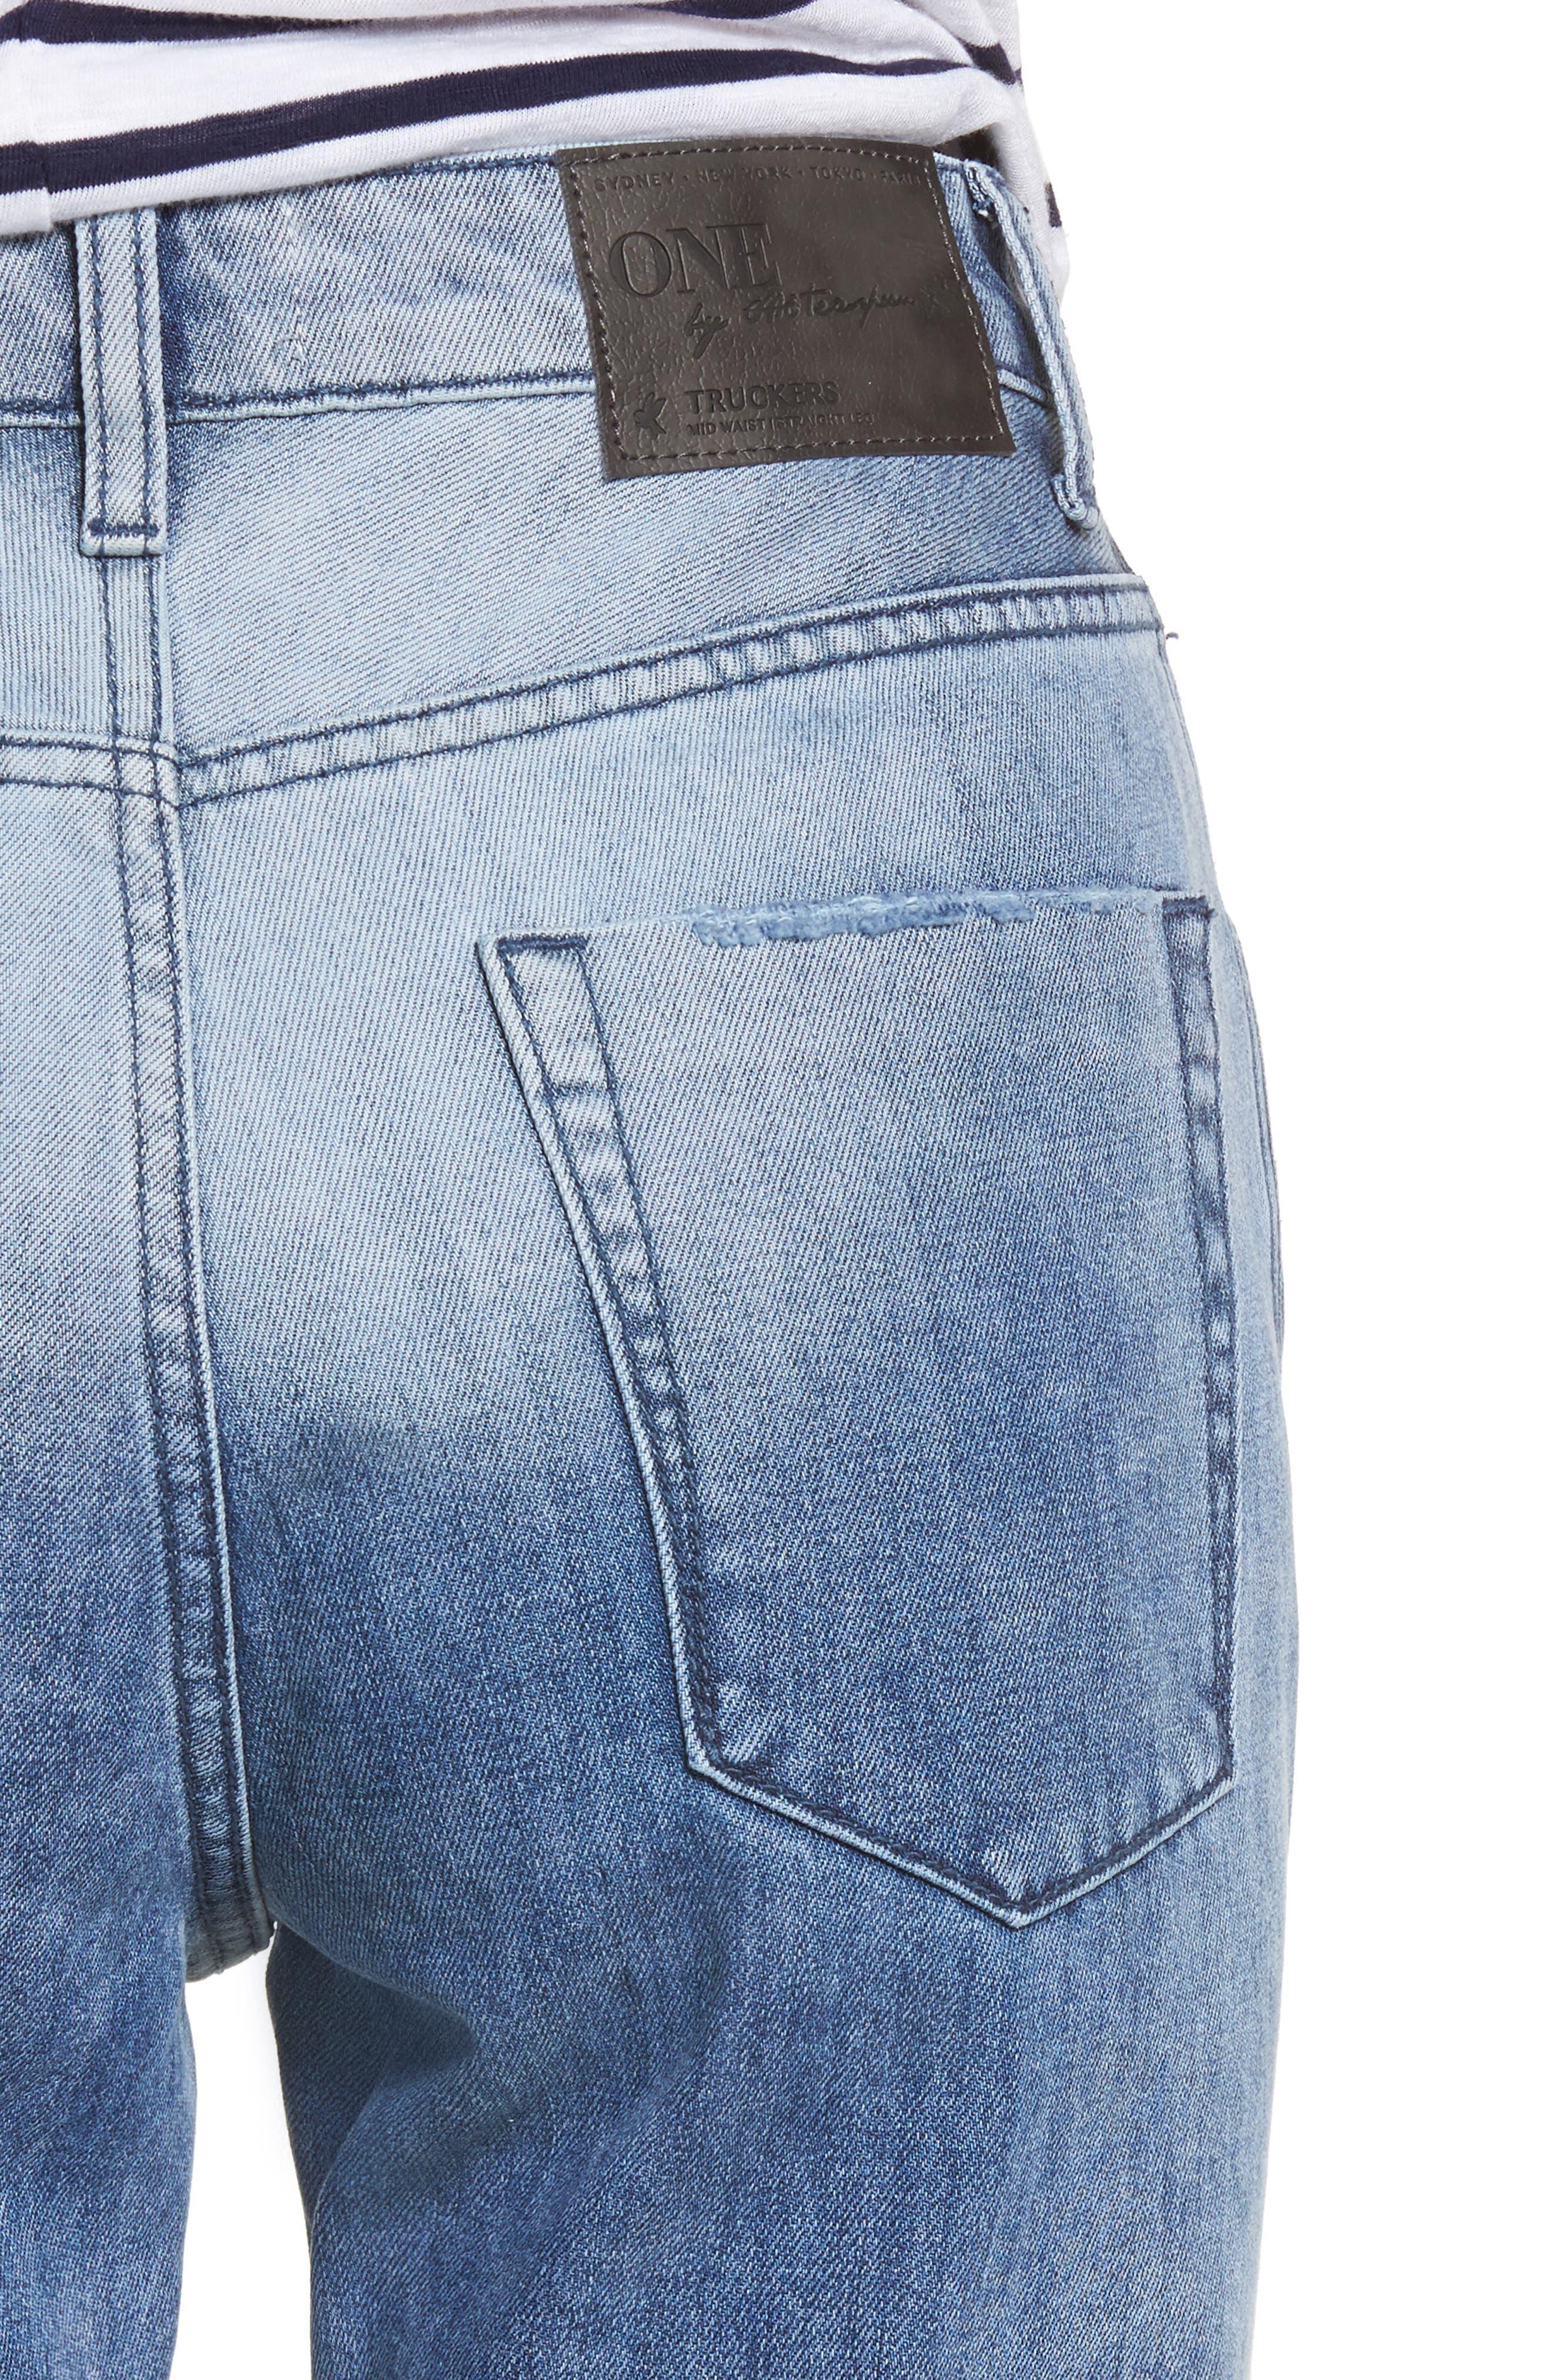 Tuckers High Waist Straight Leg Jeans,                             Alternate thumbnail 4, color,                             456